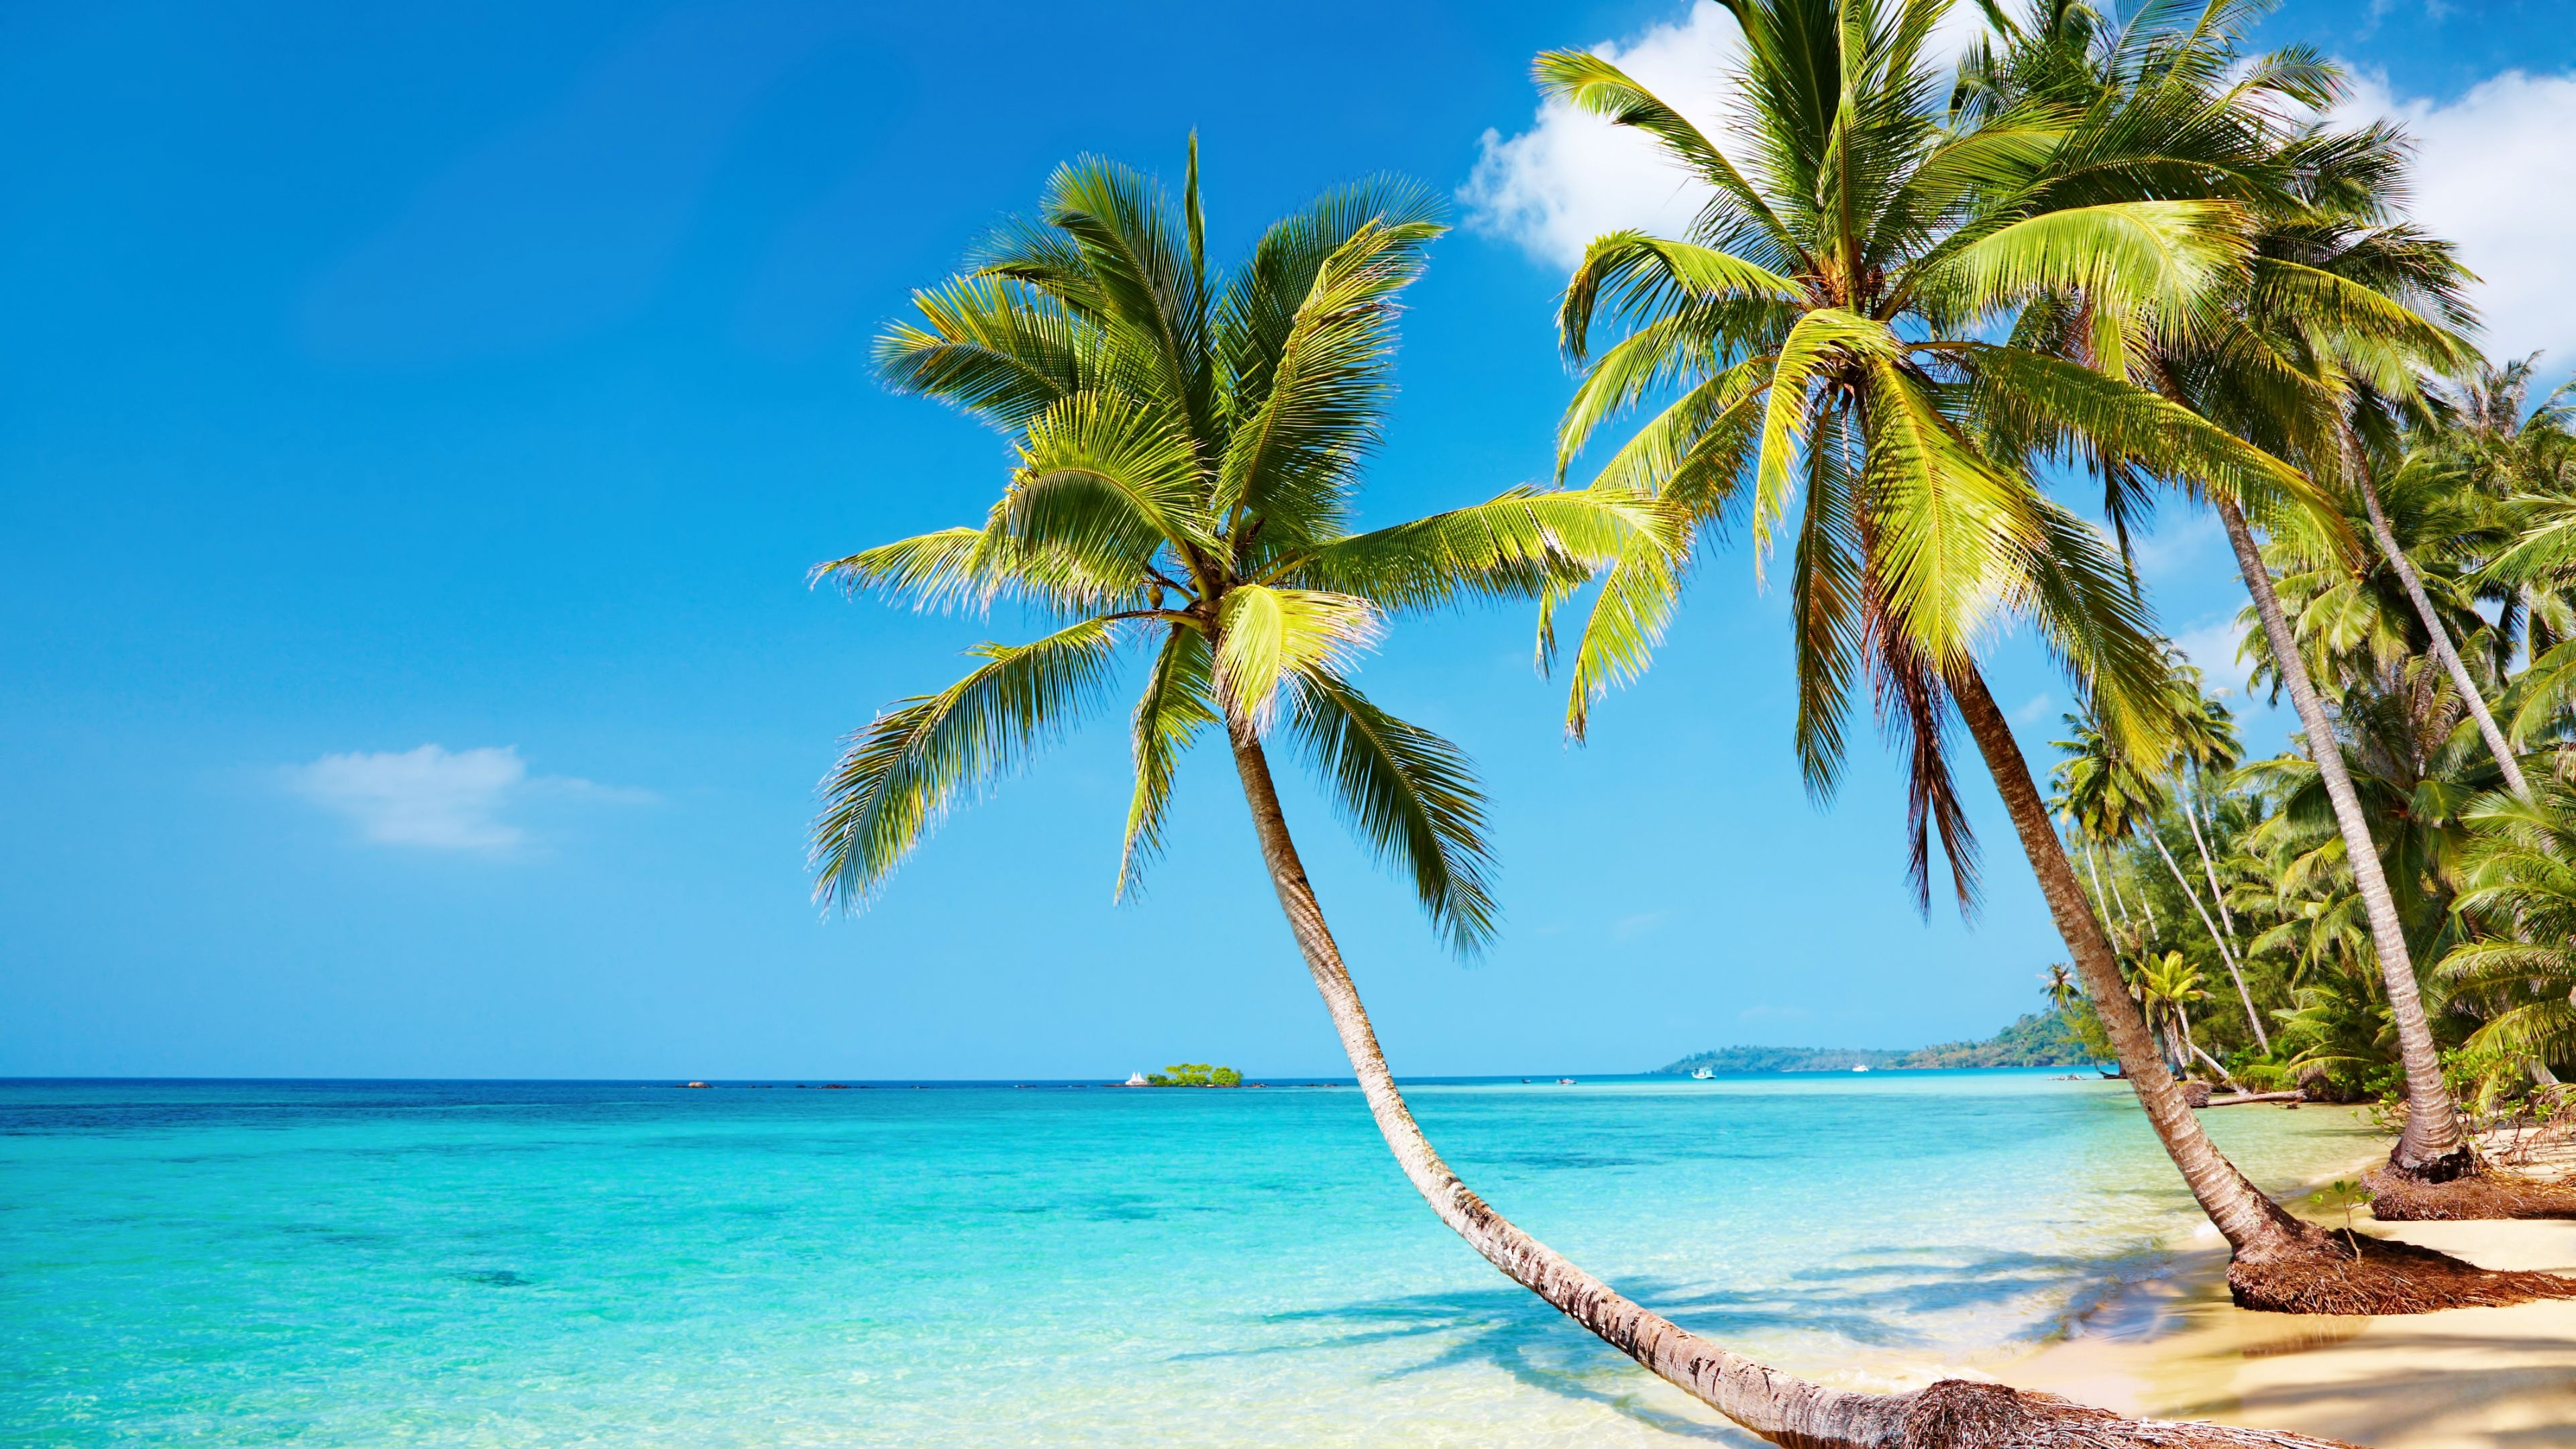 beach download